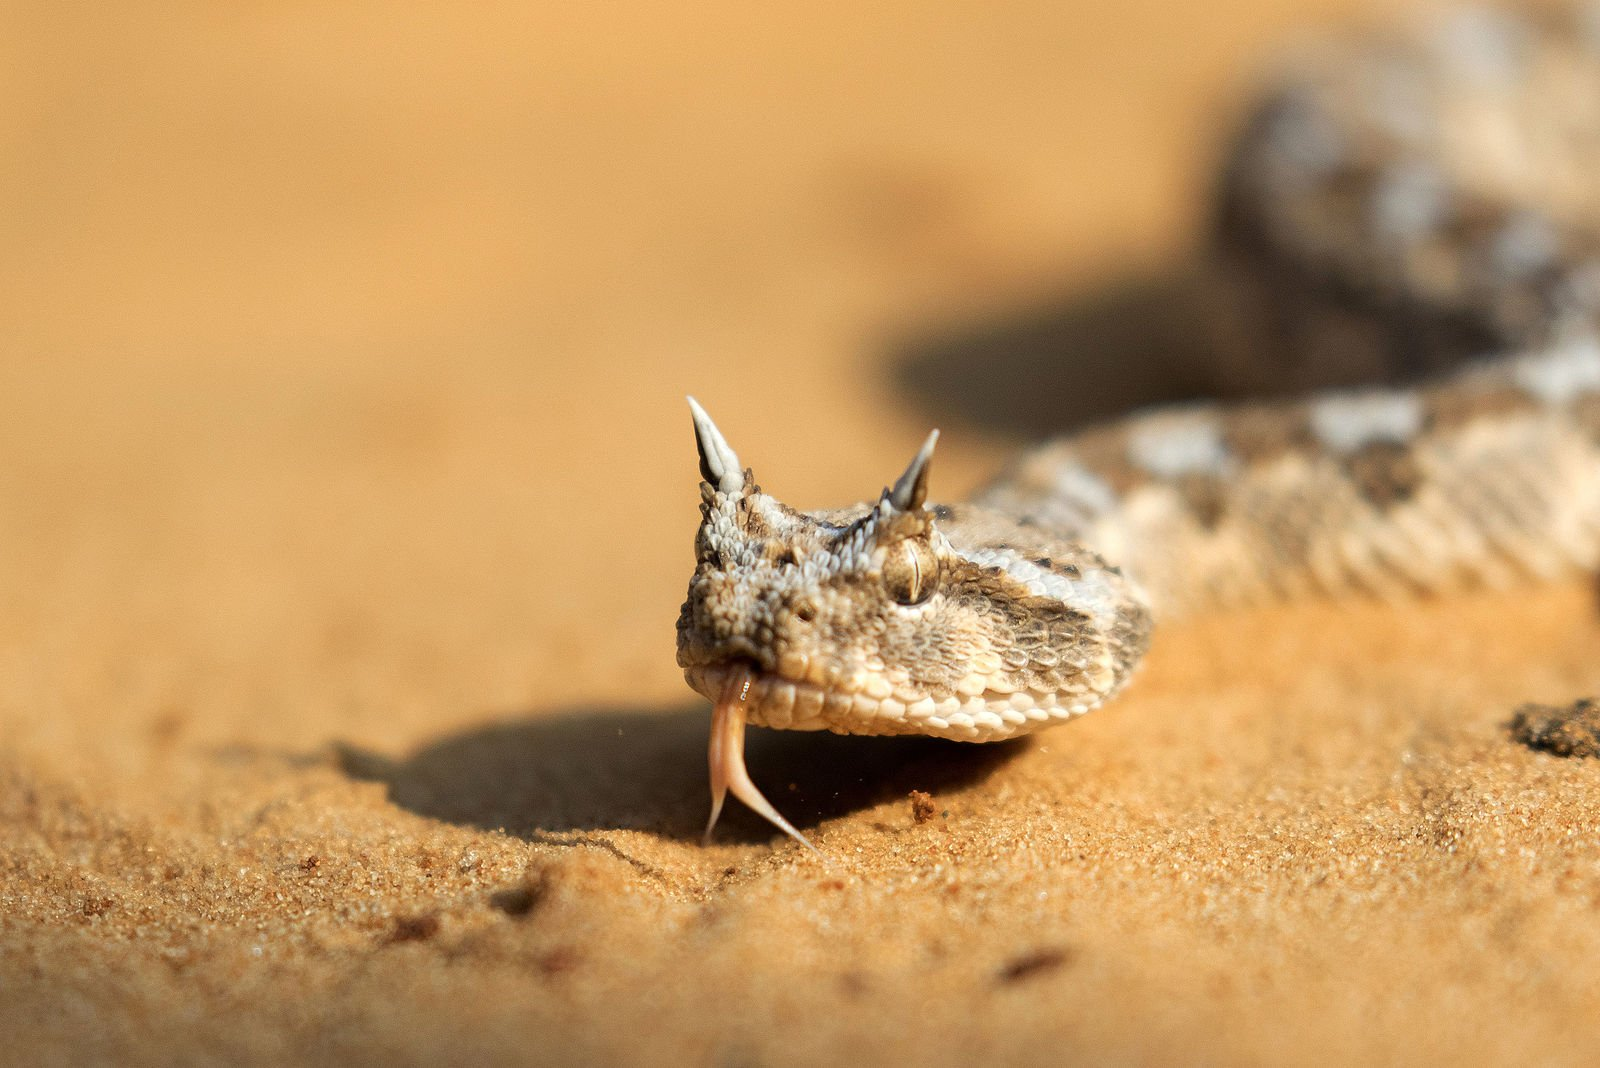 Saharan Horned Viper (Cerastes cerastes). Photo: Oronbb, Commons Wikimedia